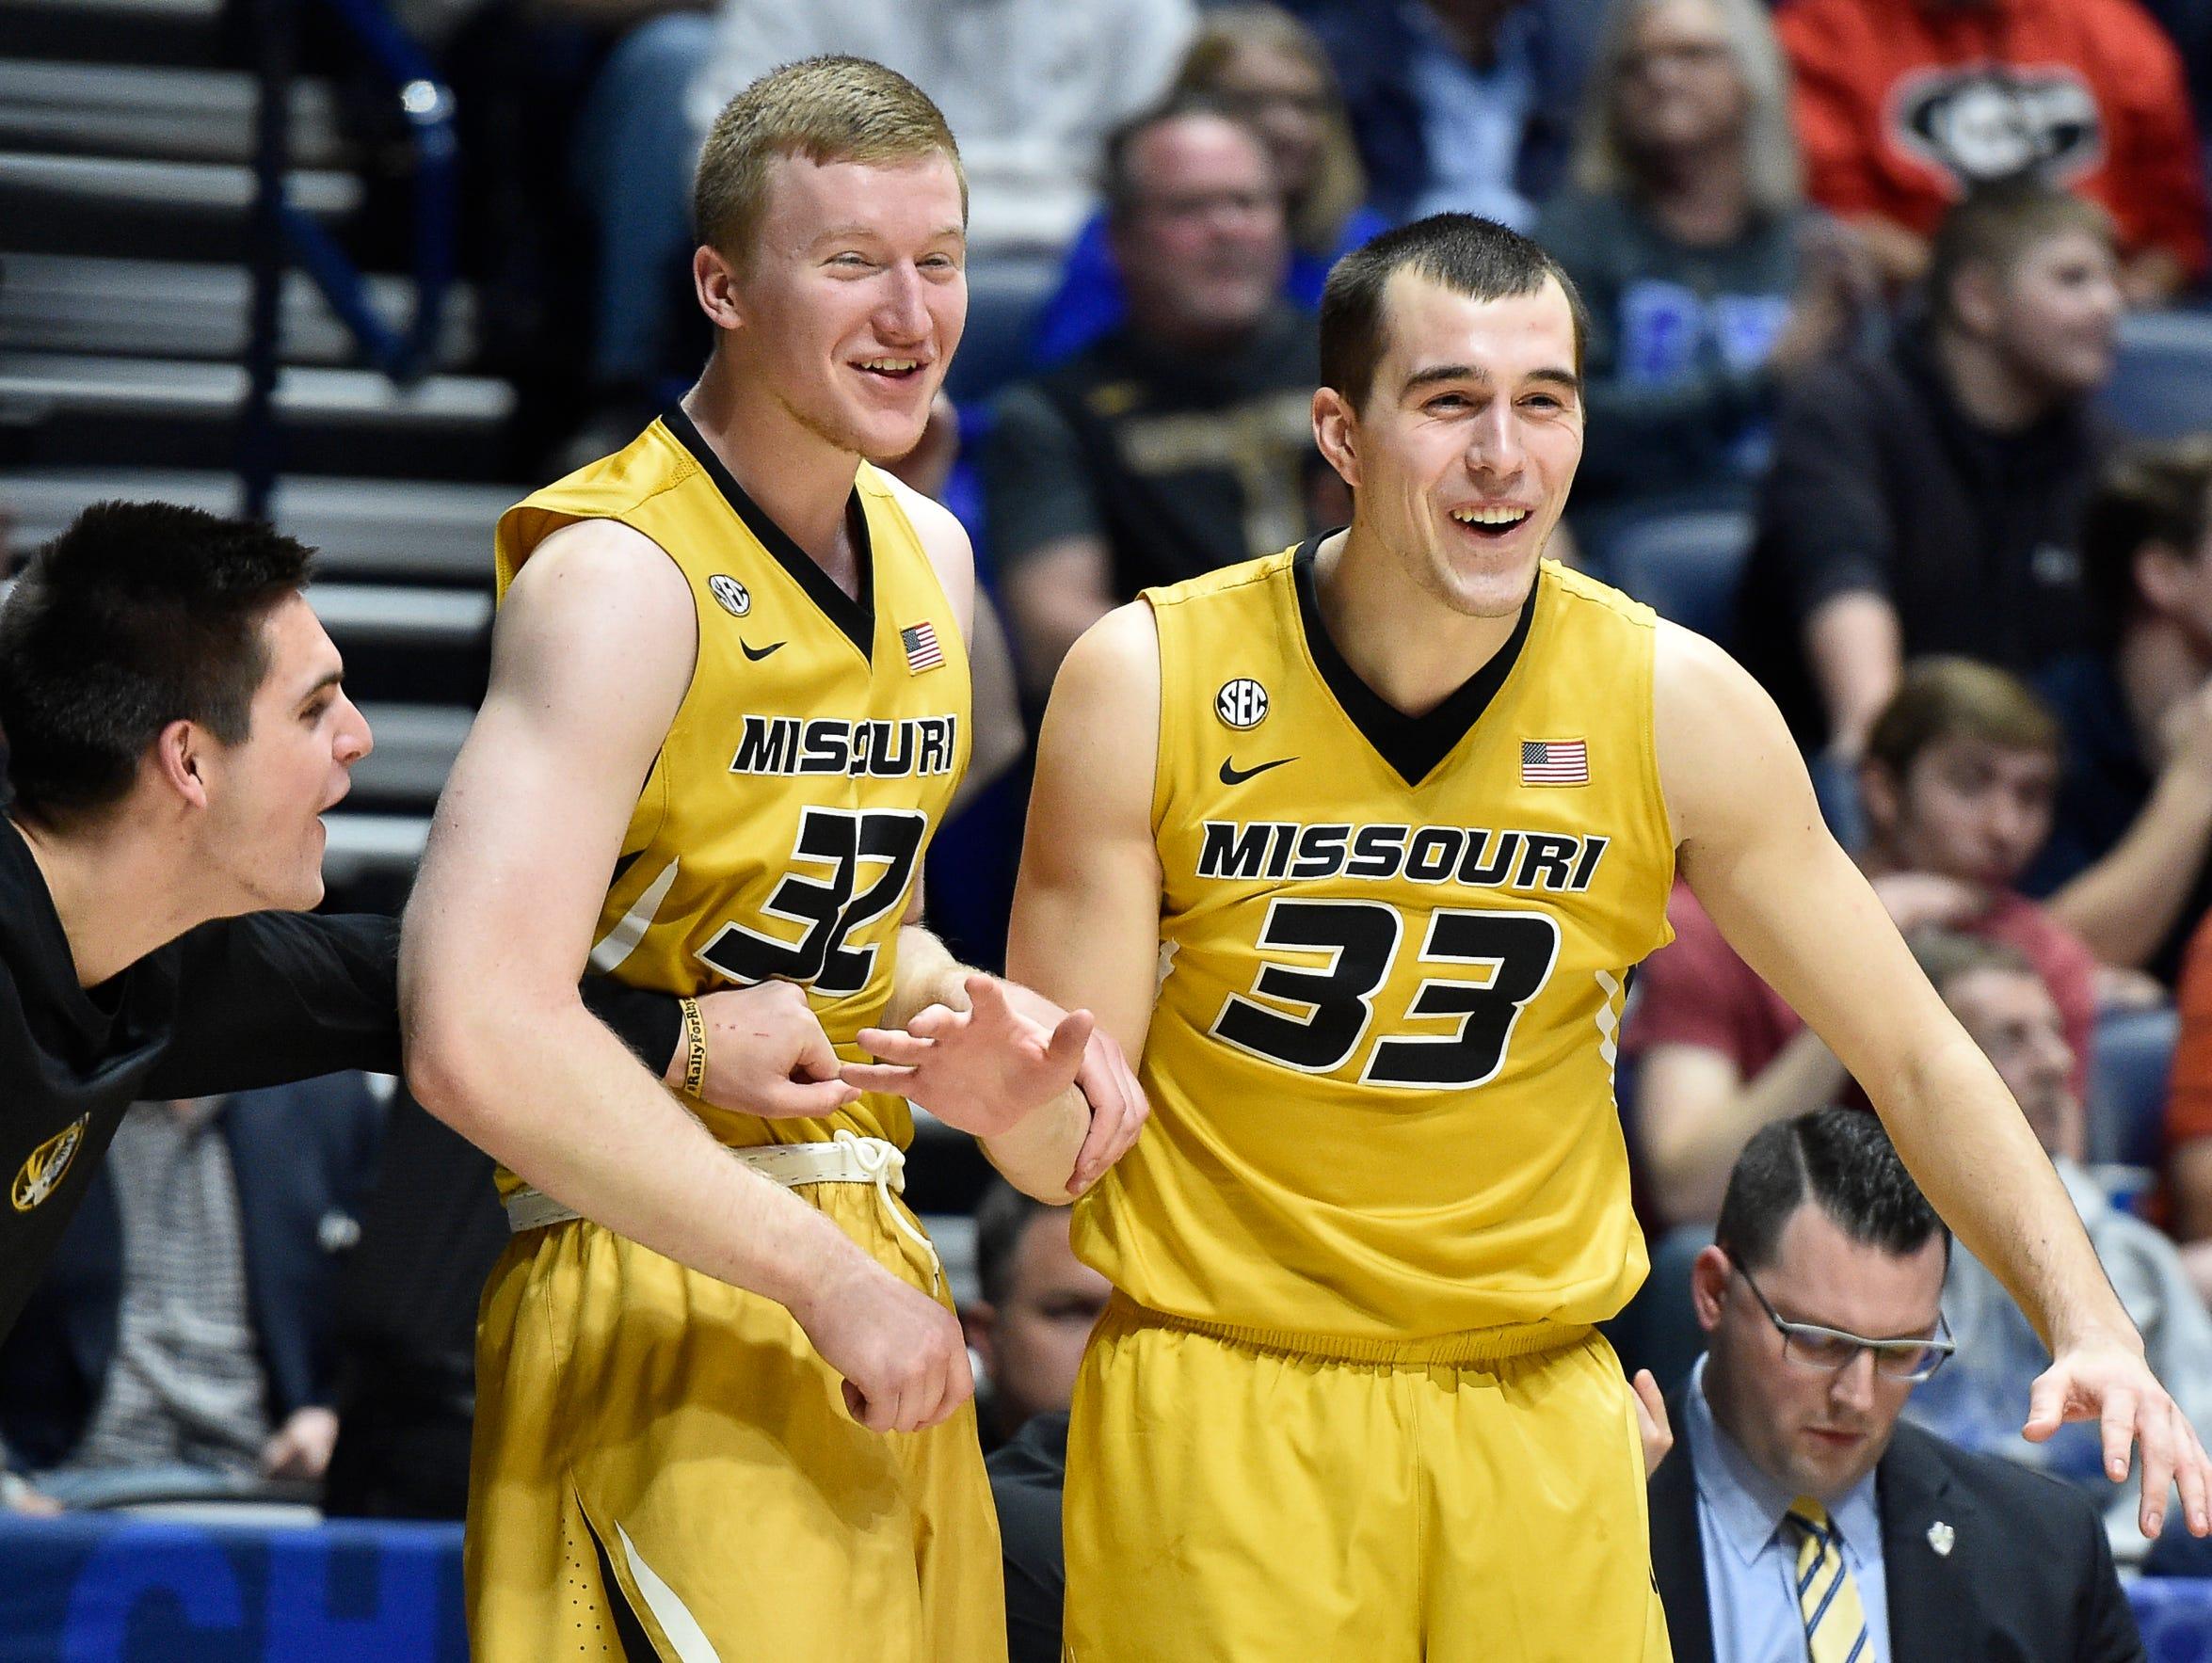 Missouri forward Adam Wolf (32) and guard Cullen VanLeer